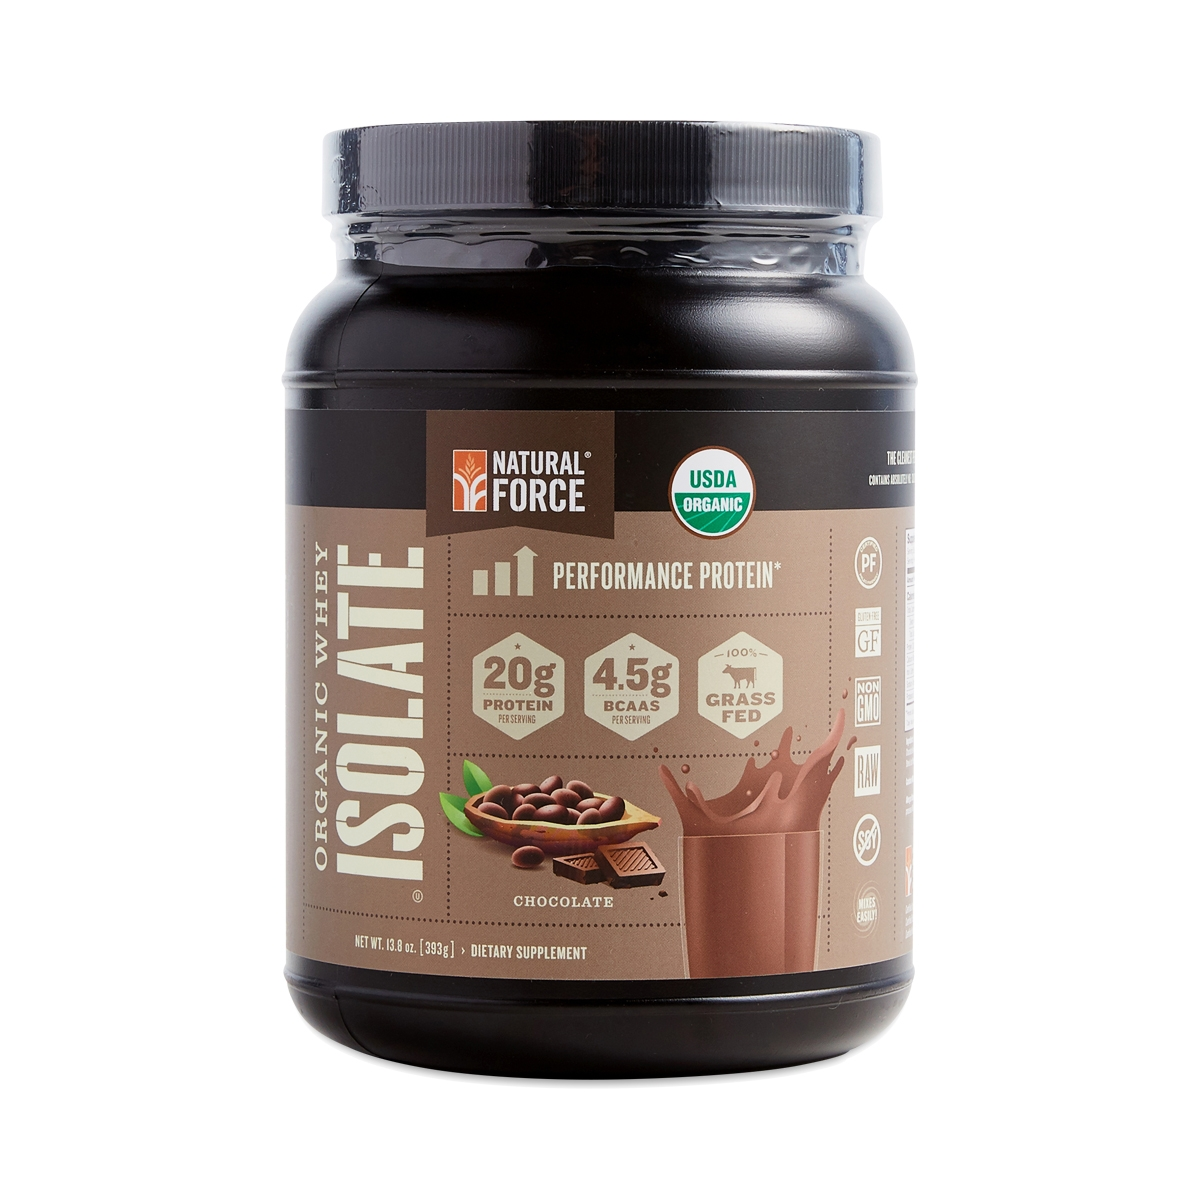 815044020316 1 The Coffee Bean And Tea Leaf K Cups